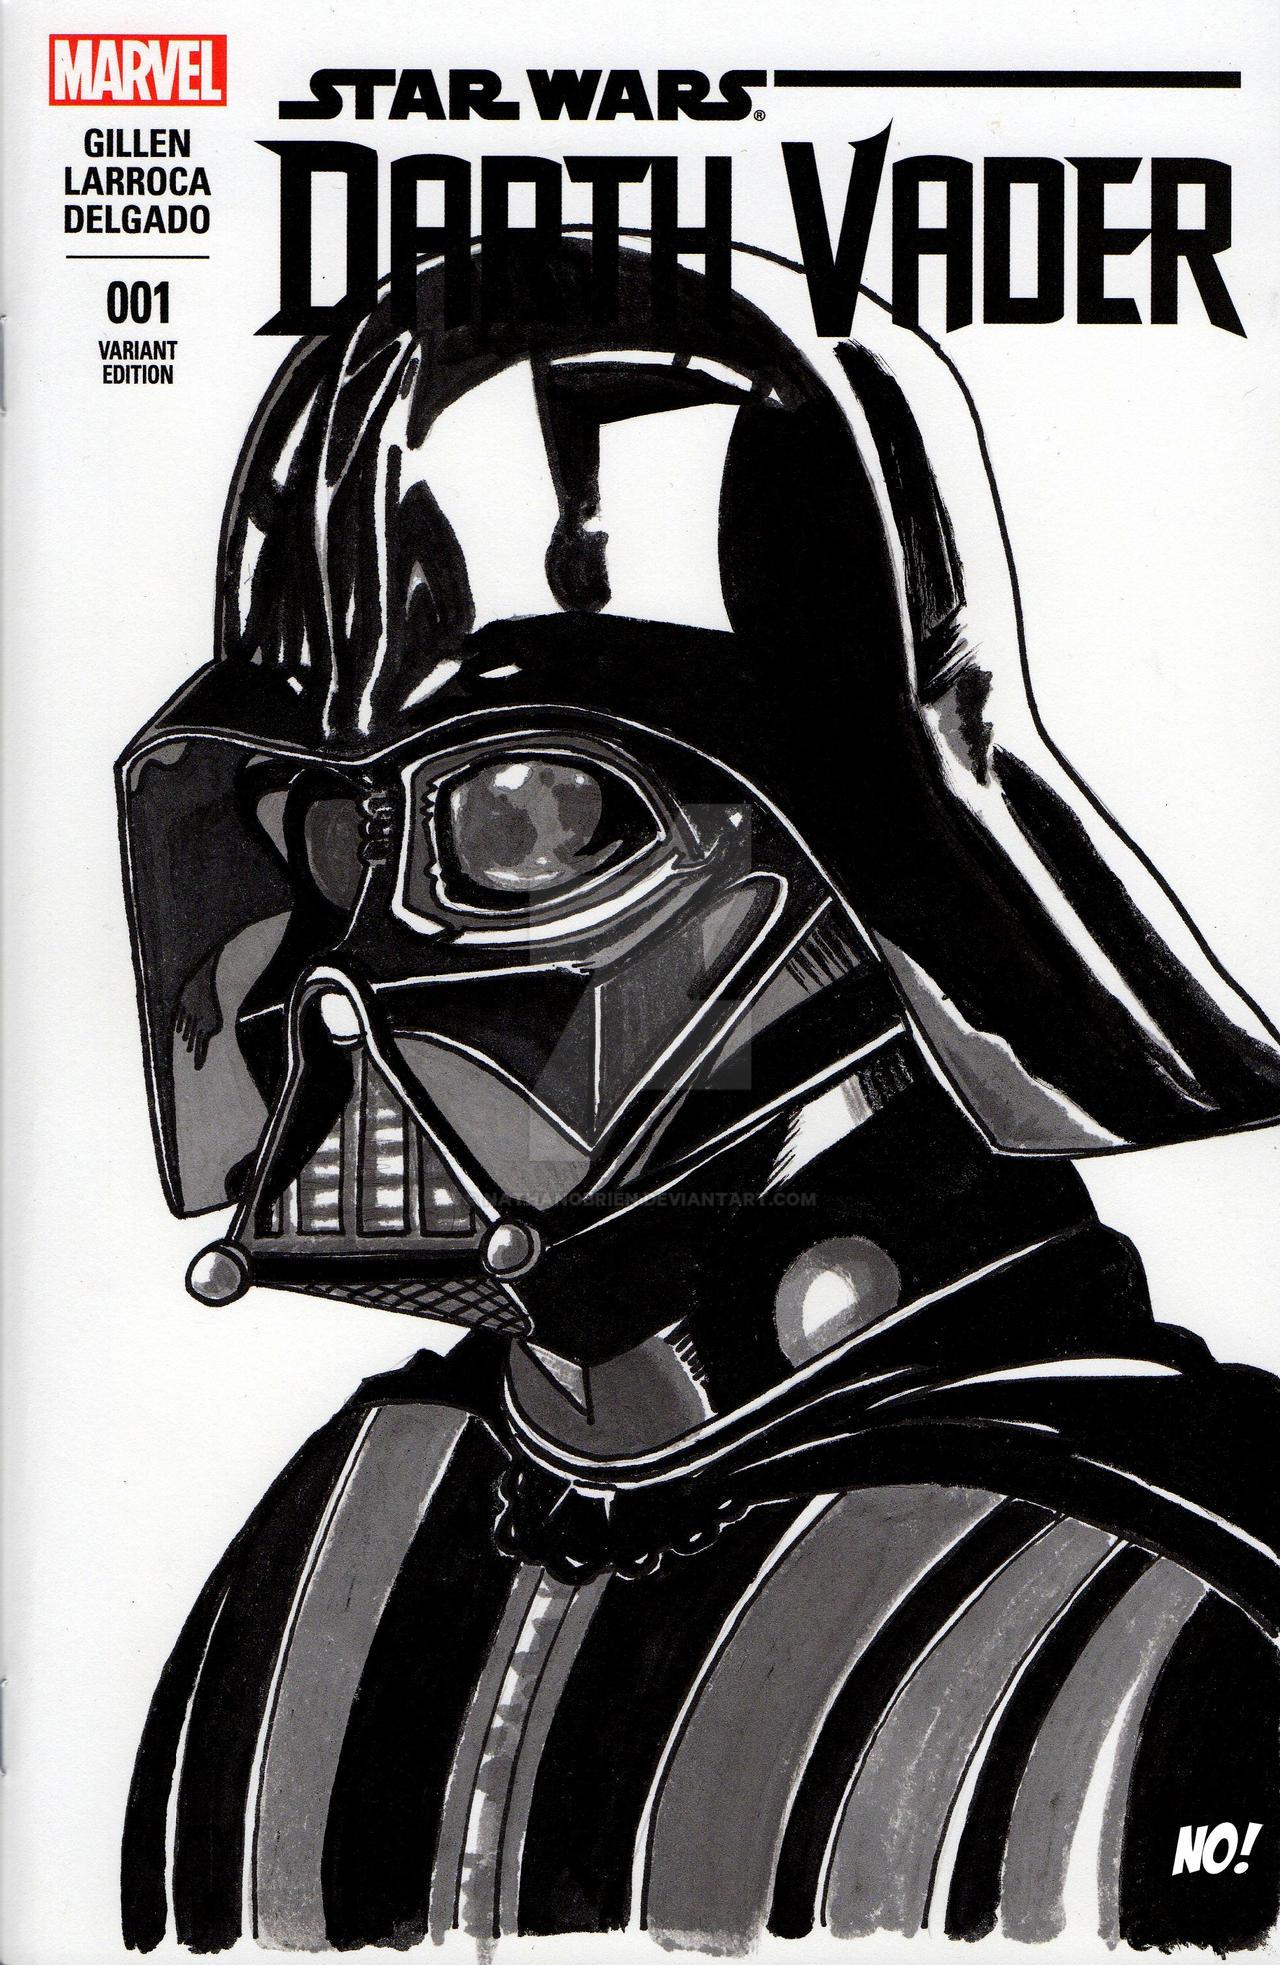 Darth Vader sketch cover by nathanobrien on DeviantArt